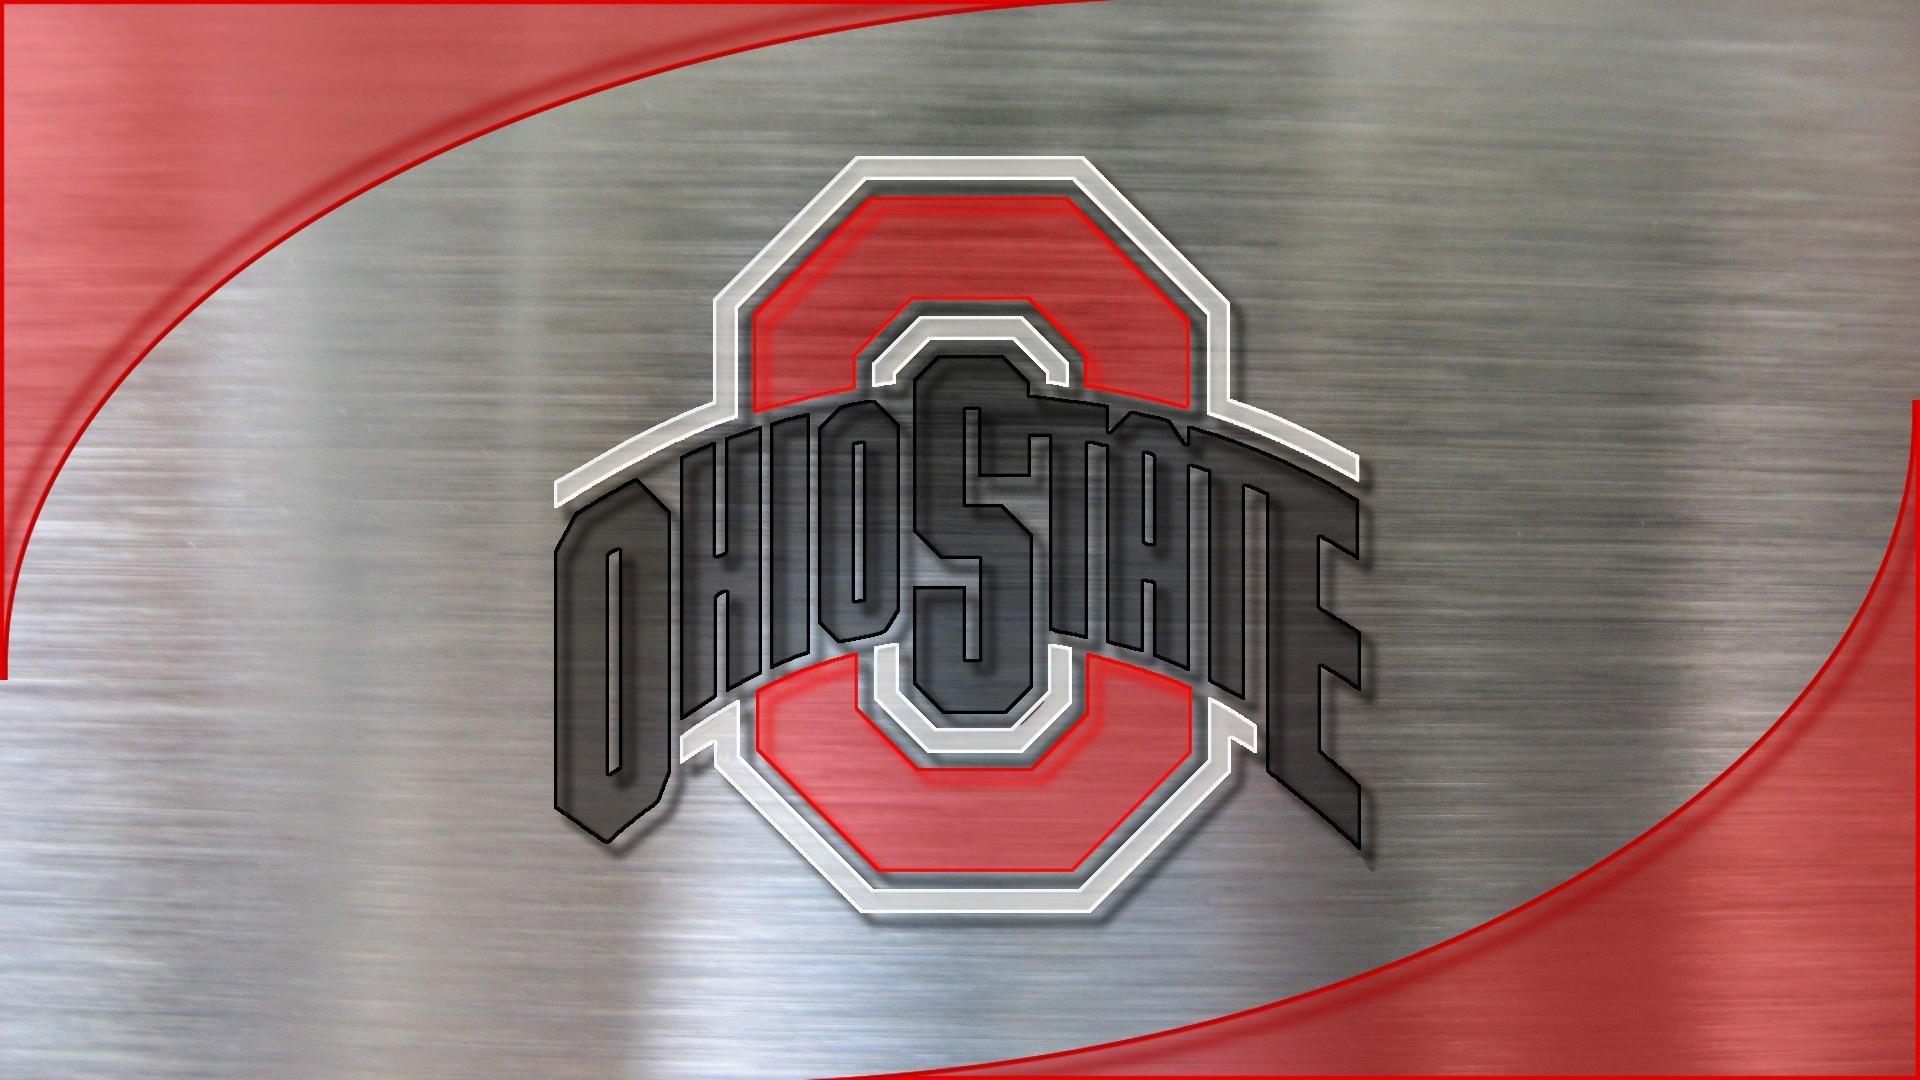 Ohio State Buckeyes Football Wallpapers Wallpaper 1920×1080 Buckeyes  Wallpapers (44 Wallpapers) |